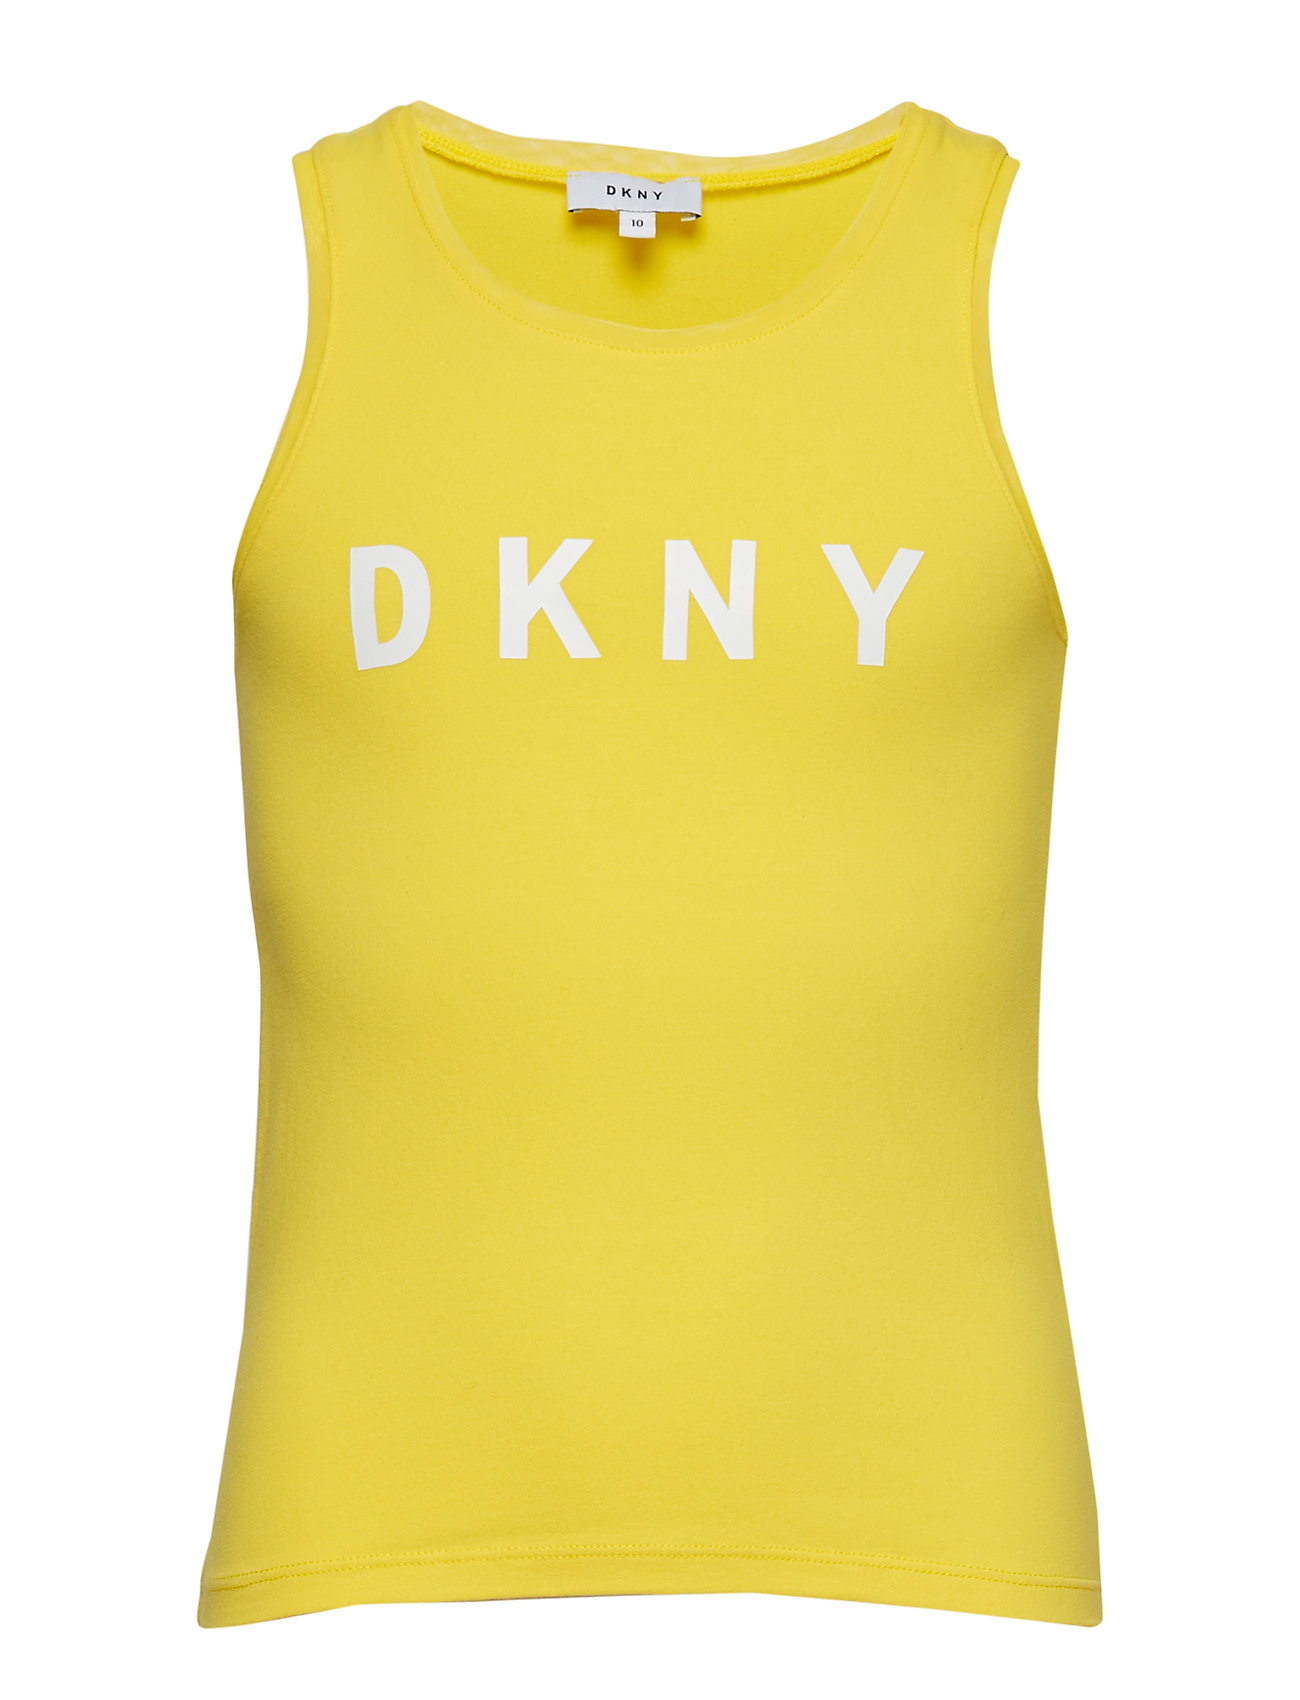 DKNY kids TANK TOP